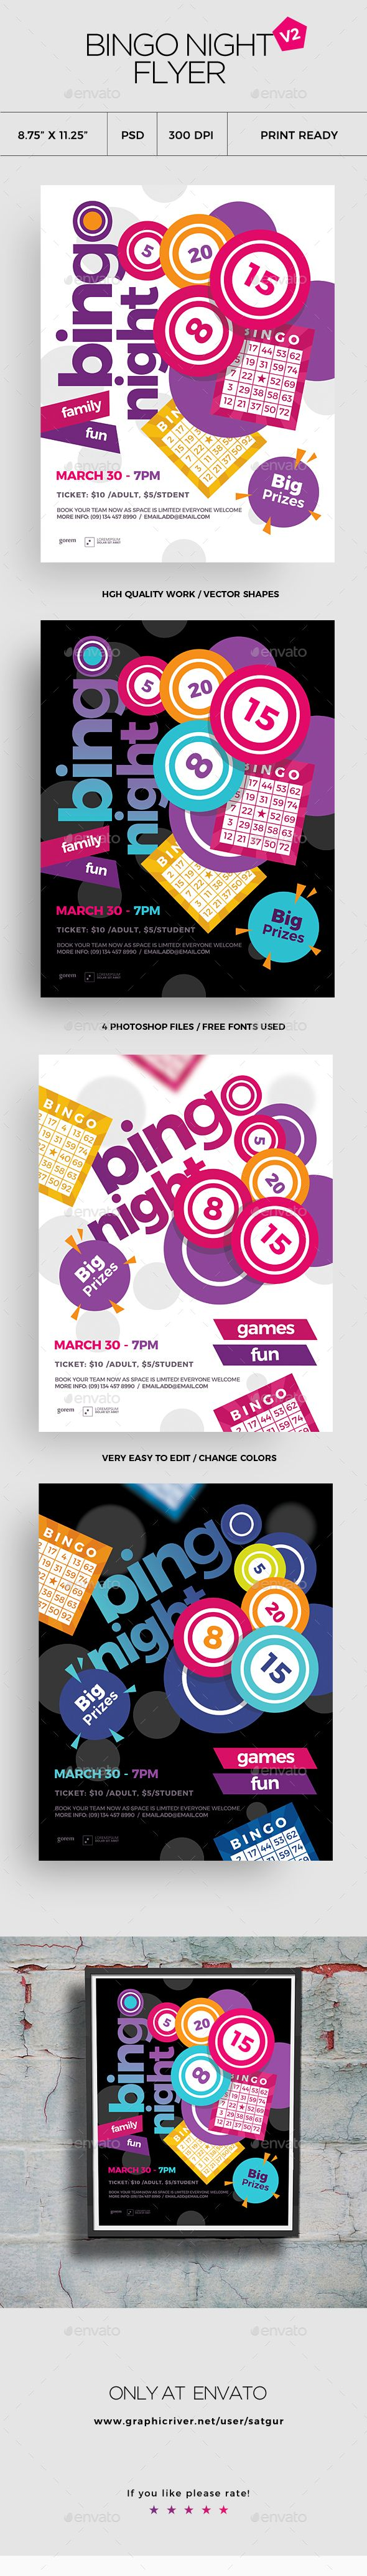 Bingo Flyer Template PSD